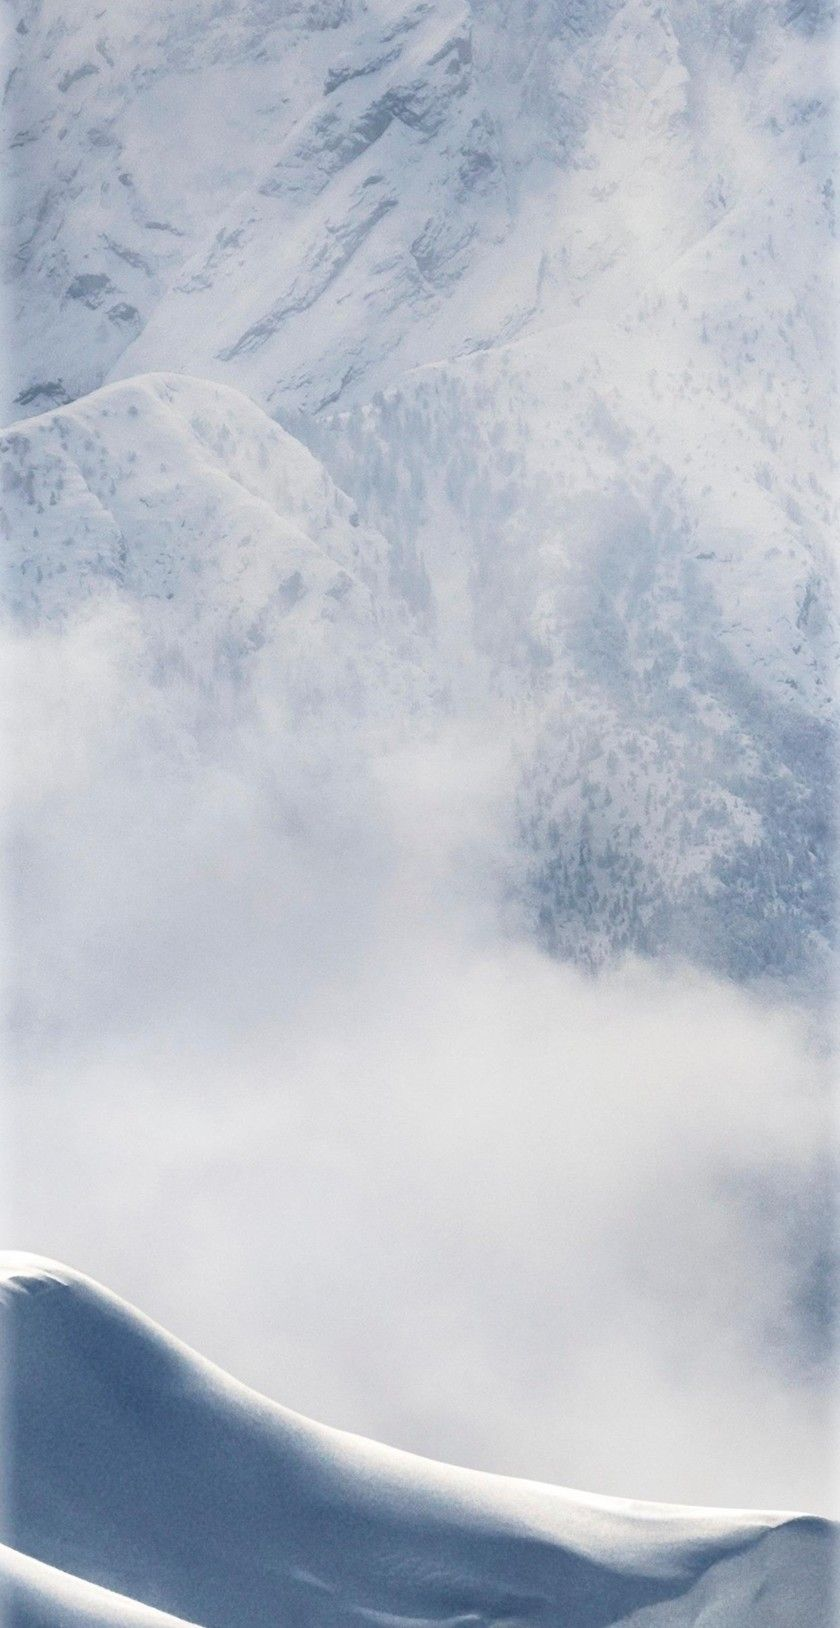 Ga galaxy s8 wallpaper stock - Mountain Wallpaper Galaxy Tranquil Beauty Nature Peaceful Calming